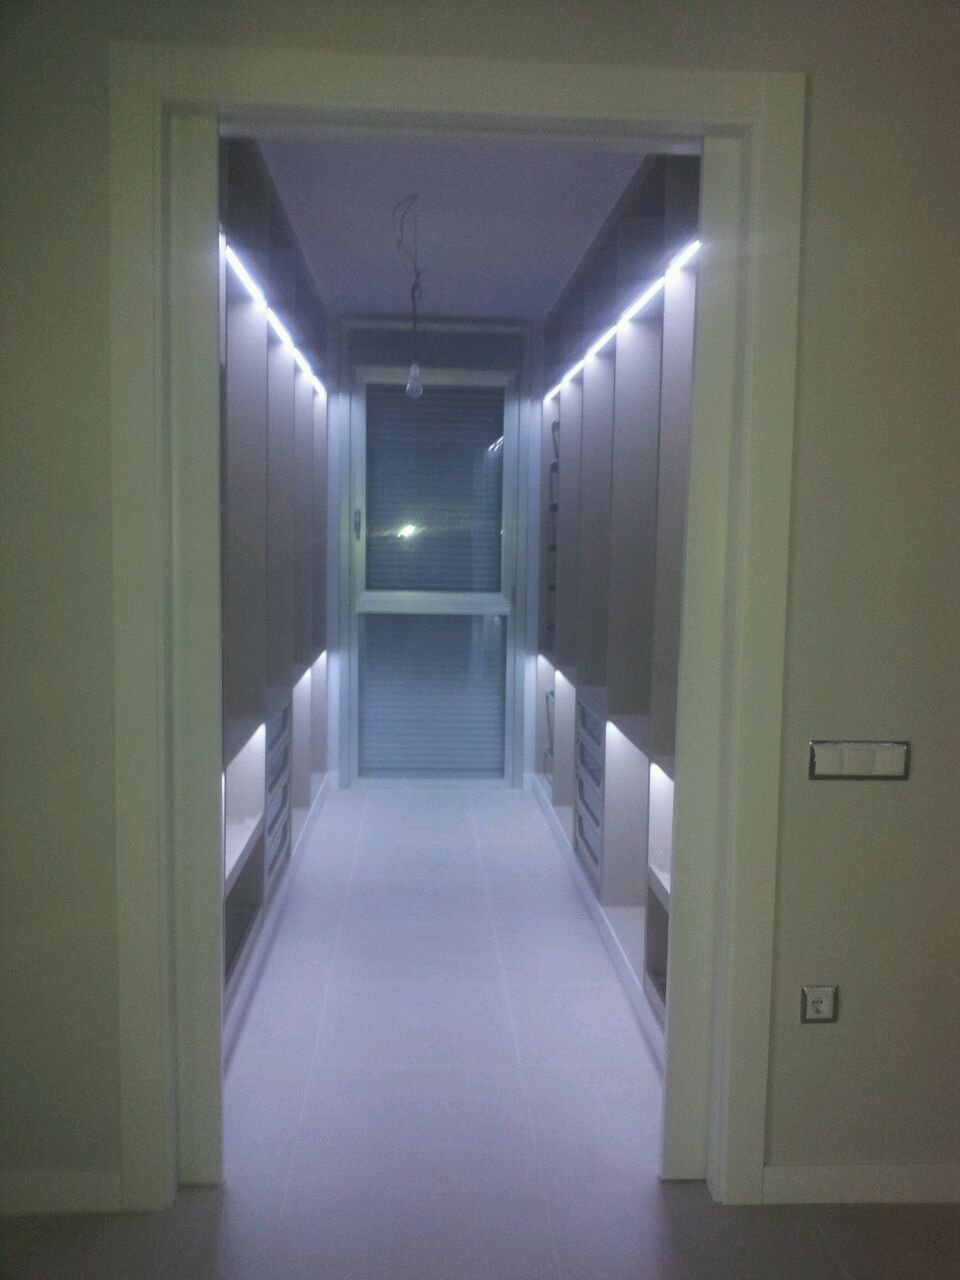 Iluminacion Led en Vestidor.